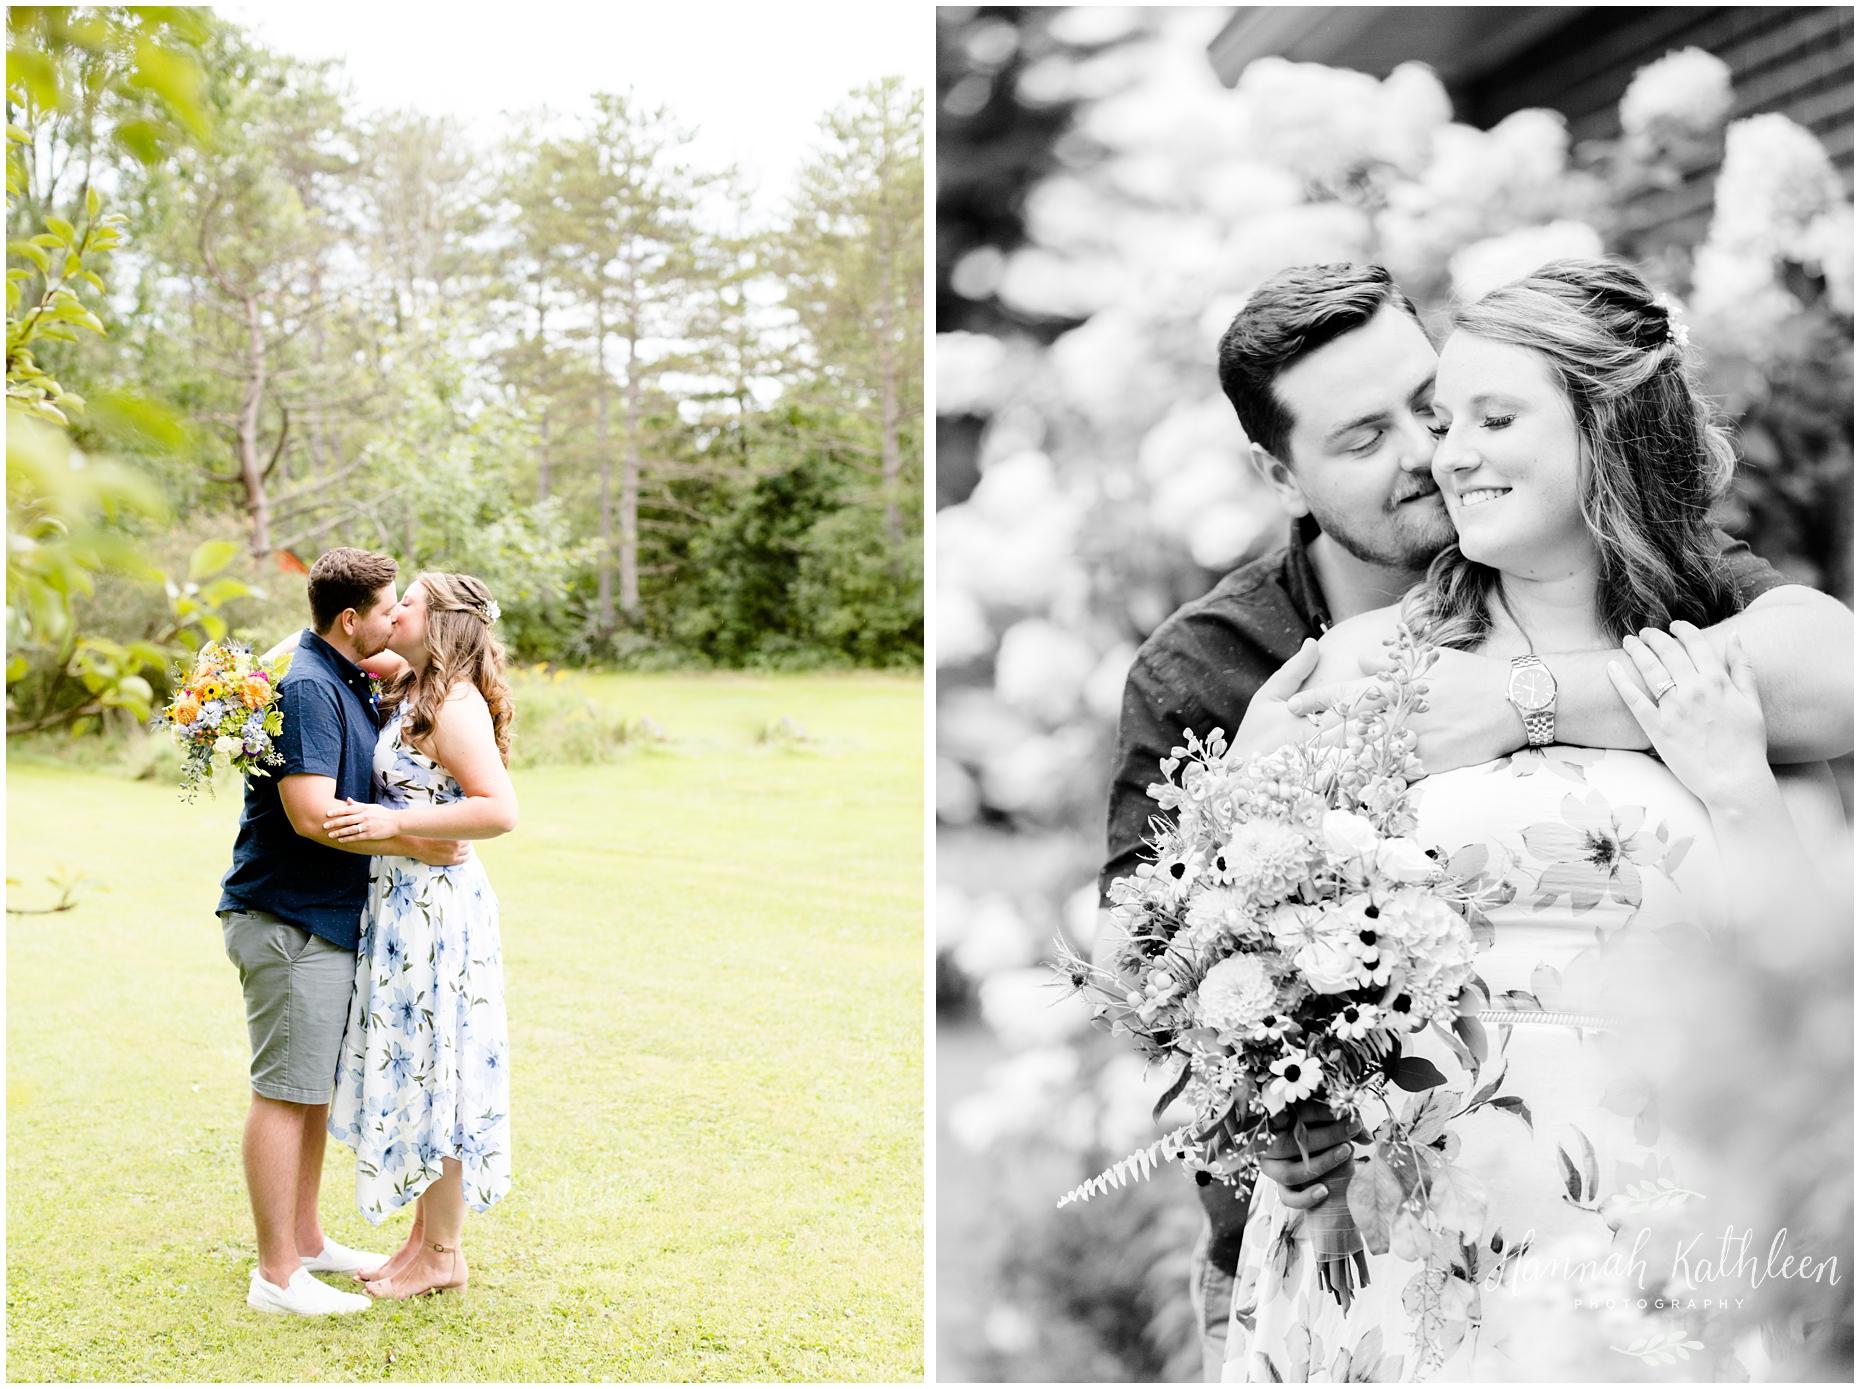 Mike_Miranda_Backyard_Small_Intimate_Elopement_Wedding_Photos_Buffalo_New_York